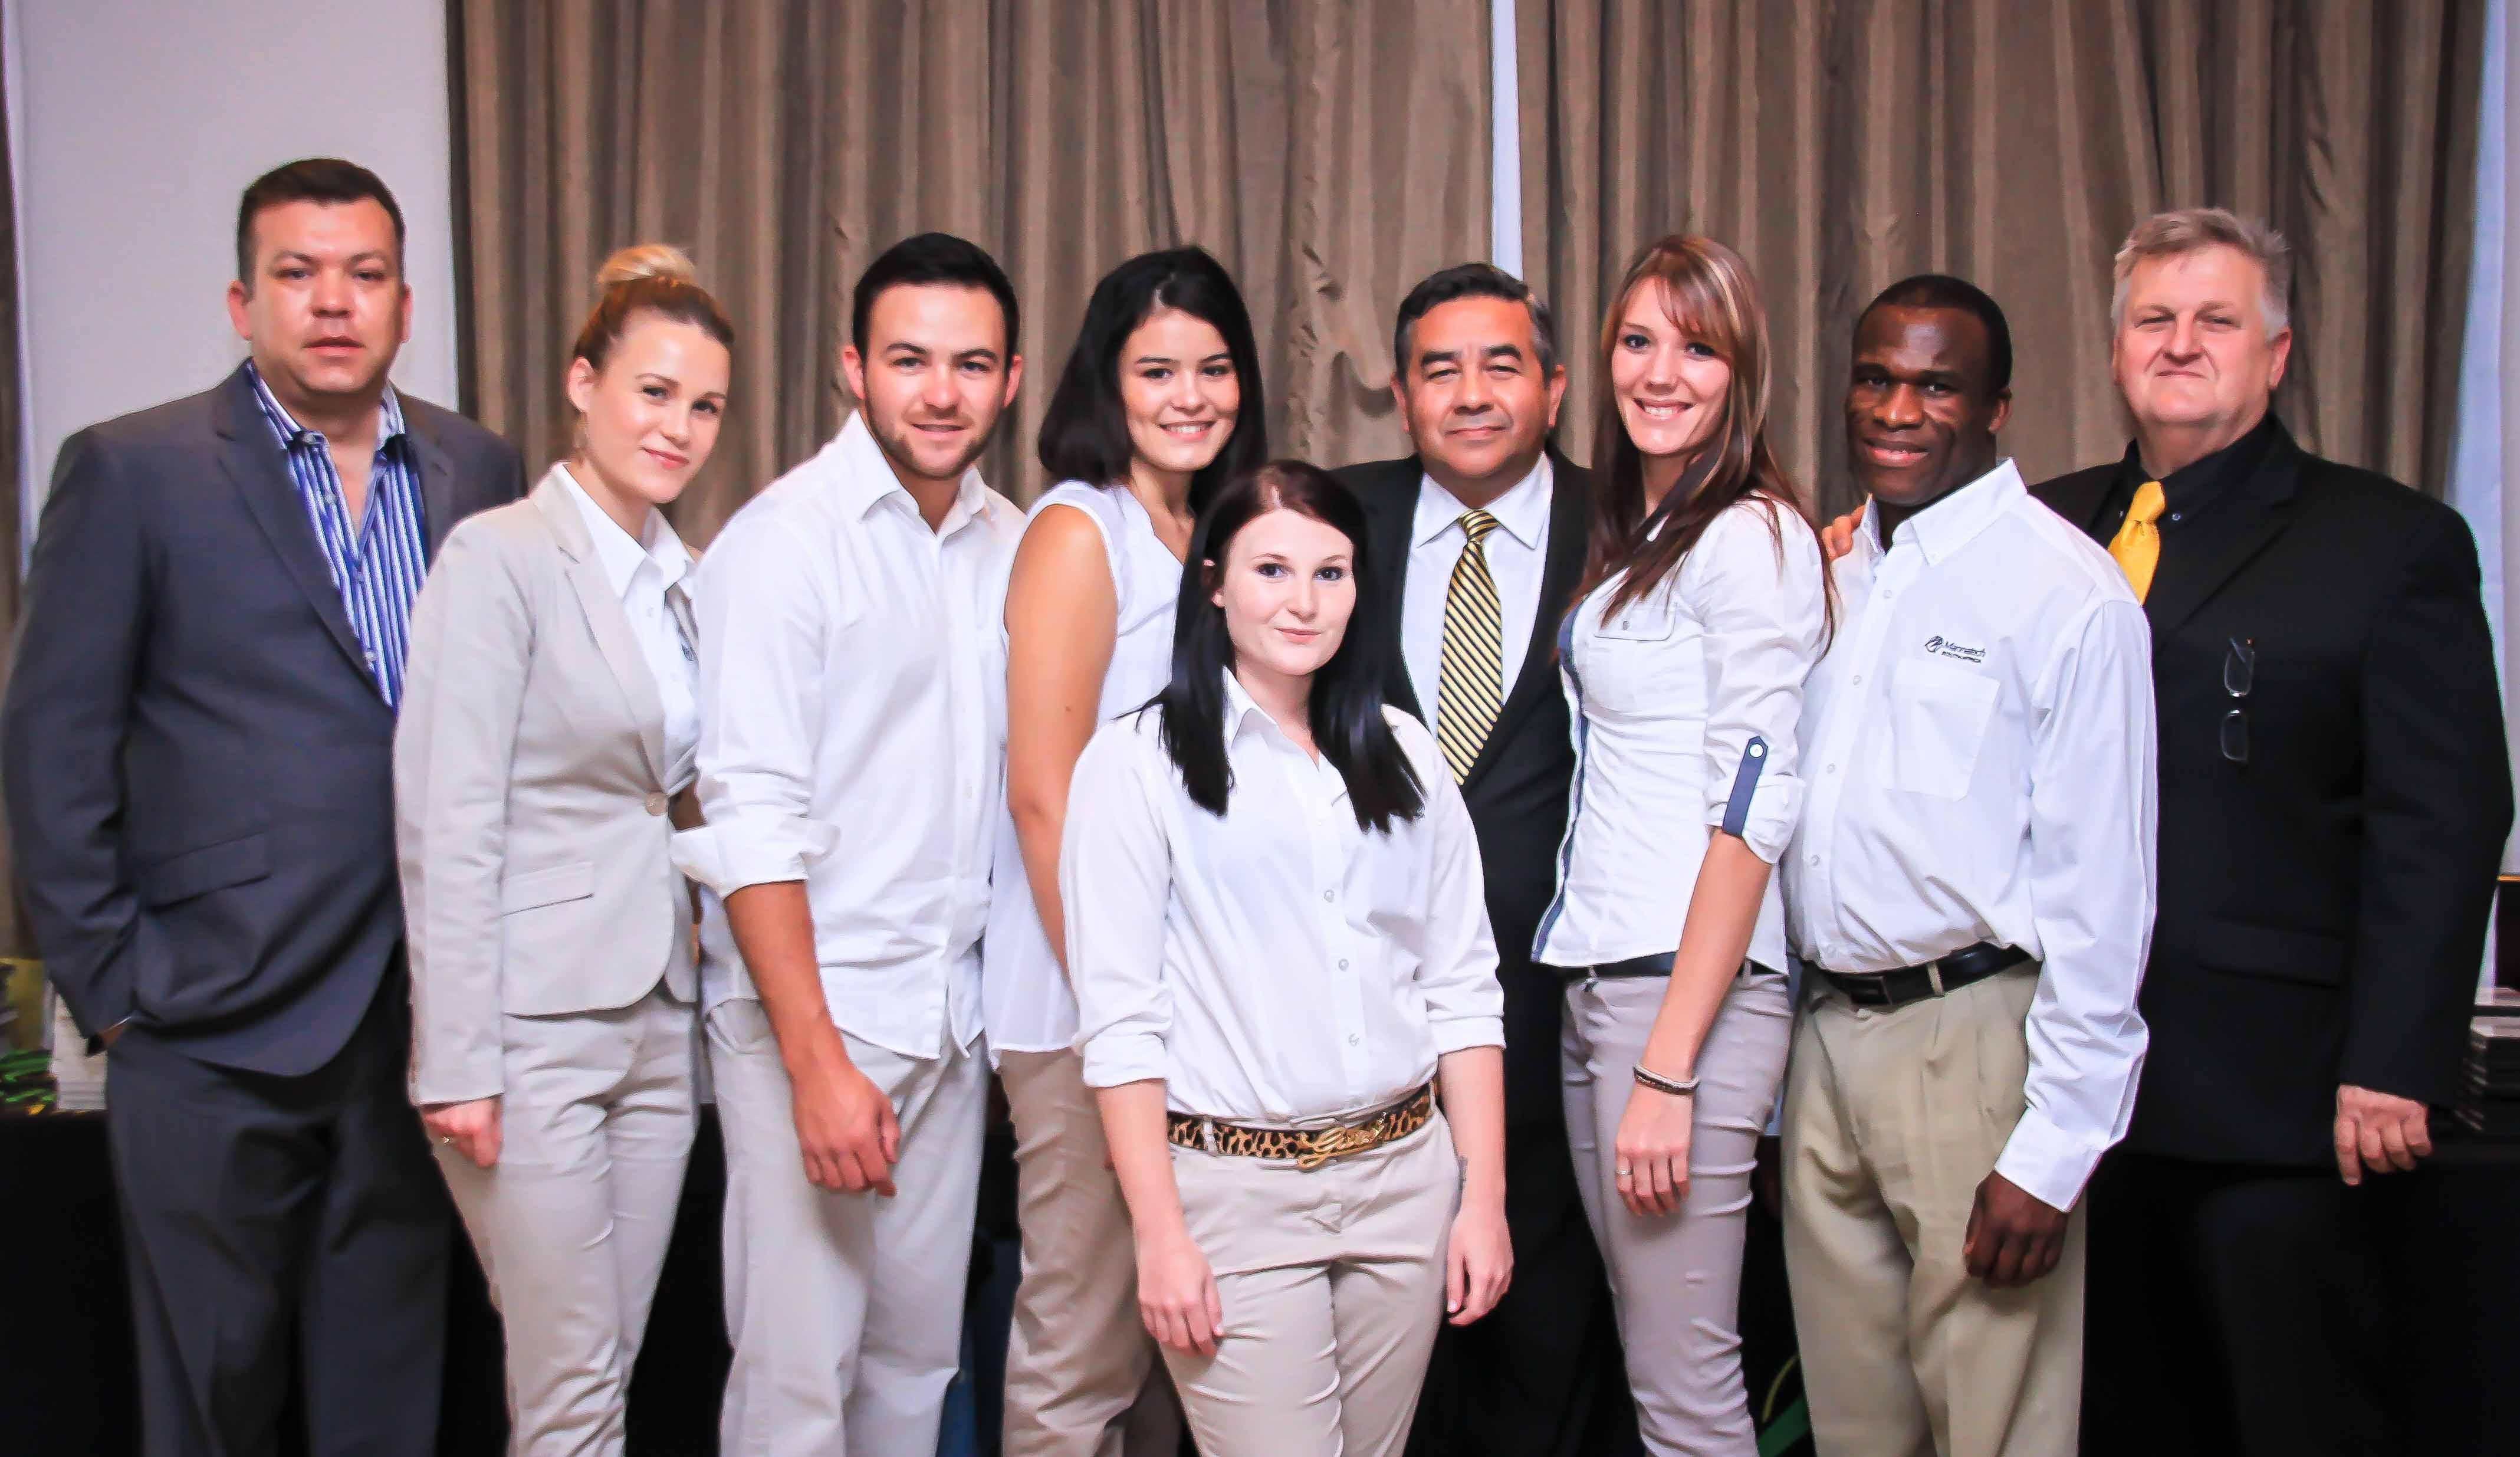 SA Super Regional - new leaders